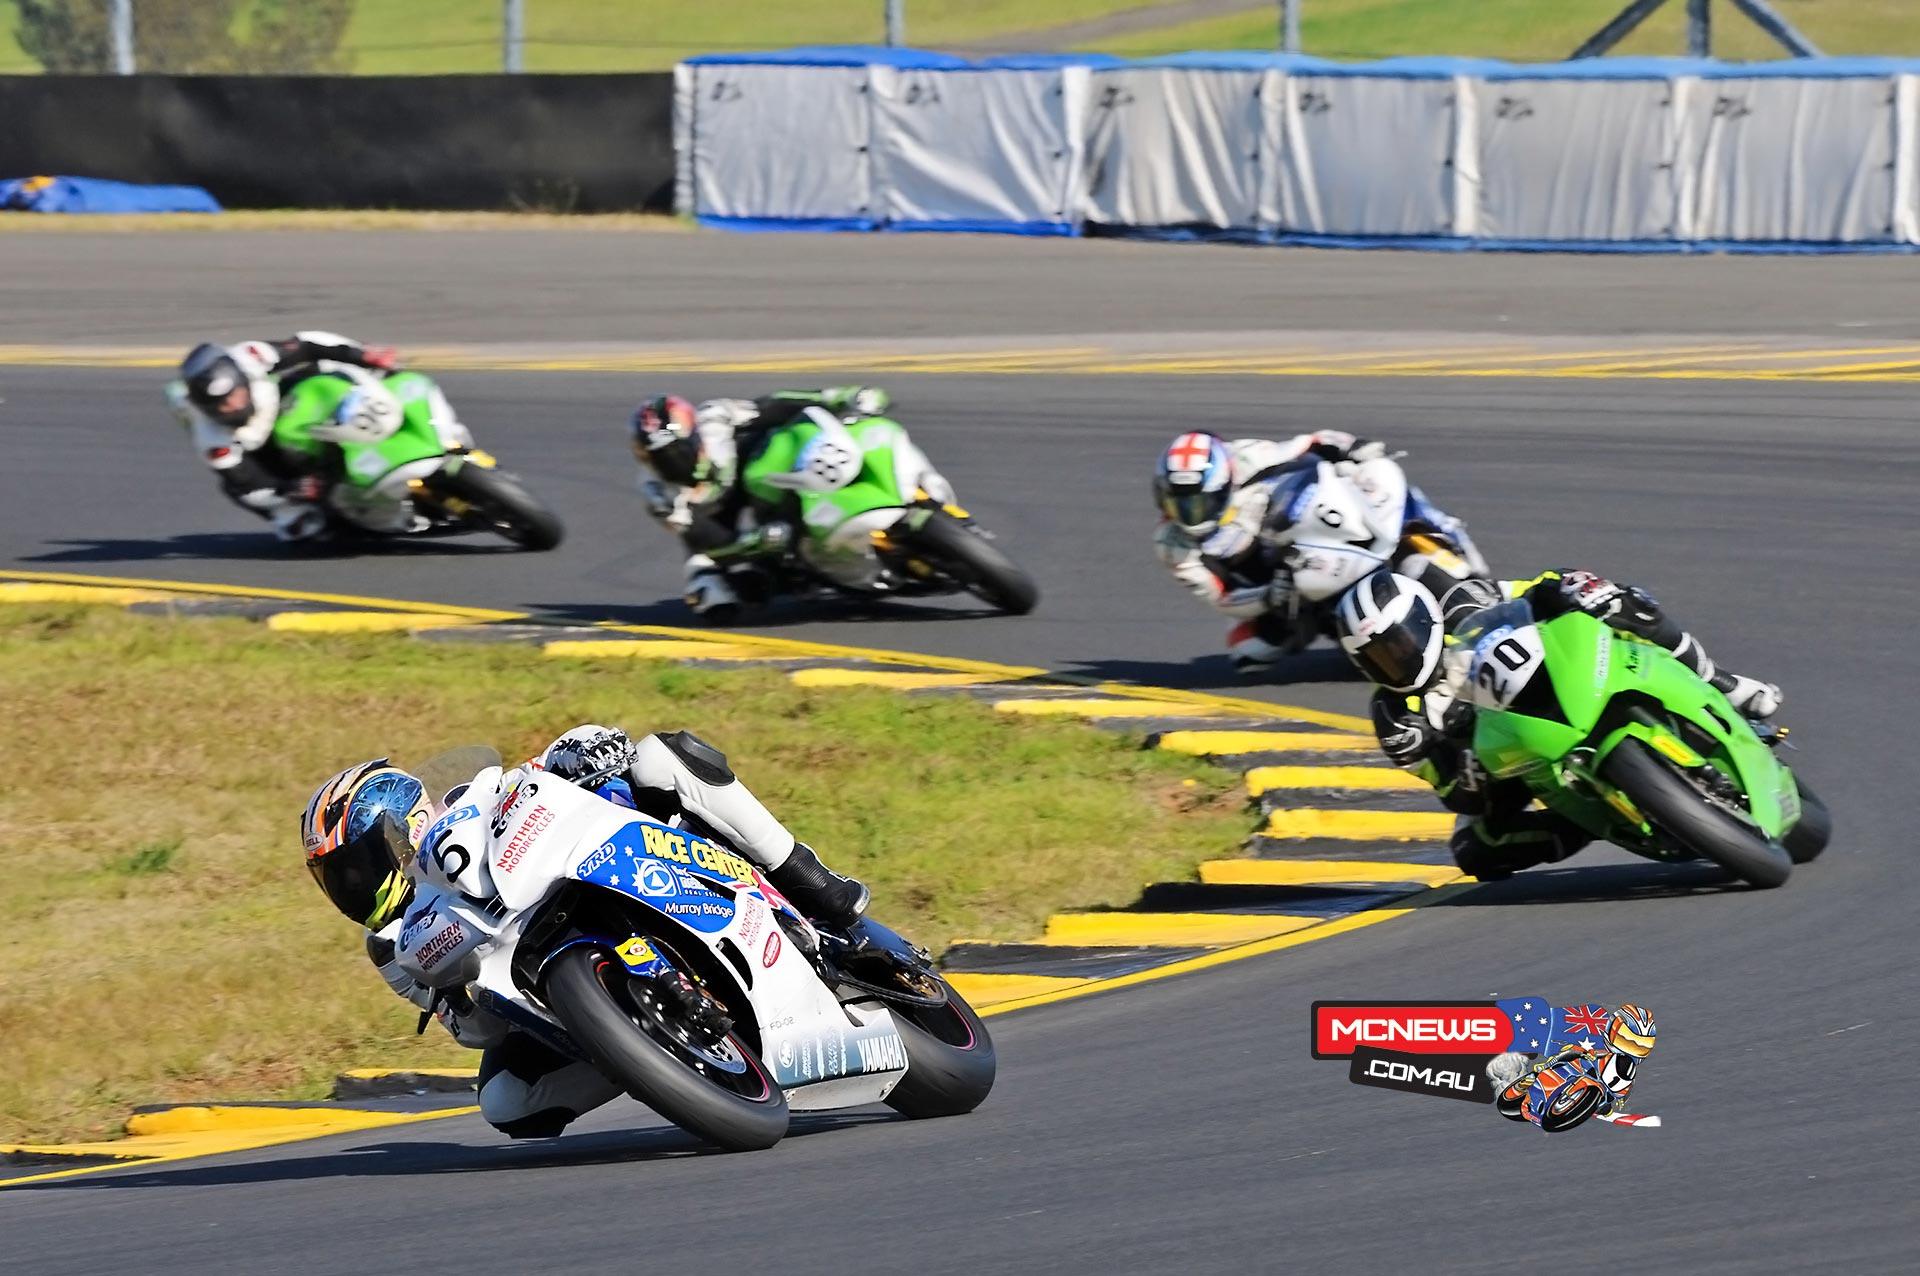 Jay-Presepio-Rick-Olson-Luke-Mitchell-FX-ASC-Formula-Xtreme-FX-Superbikes-Swann-Australasian-FX-Superbike-Championship-2015-Sydney-Motorsports-Park